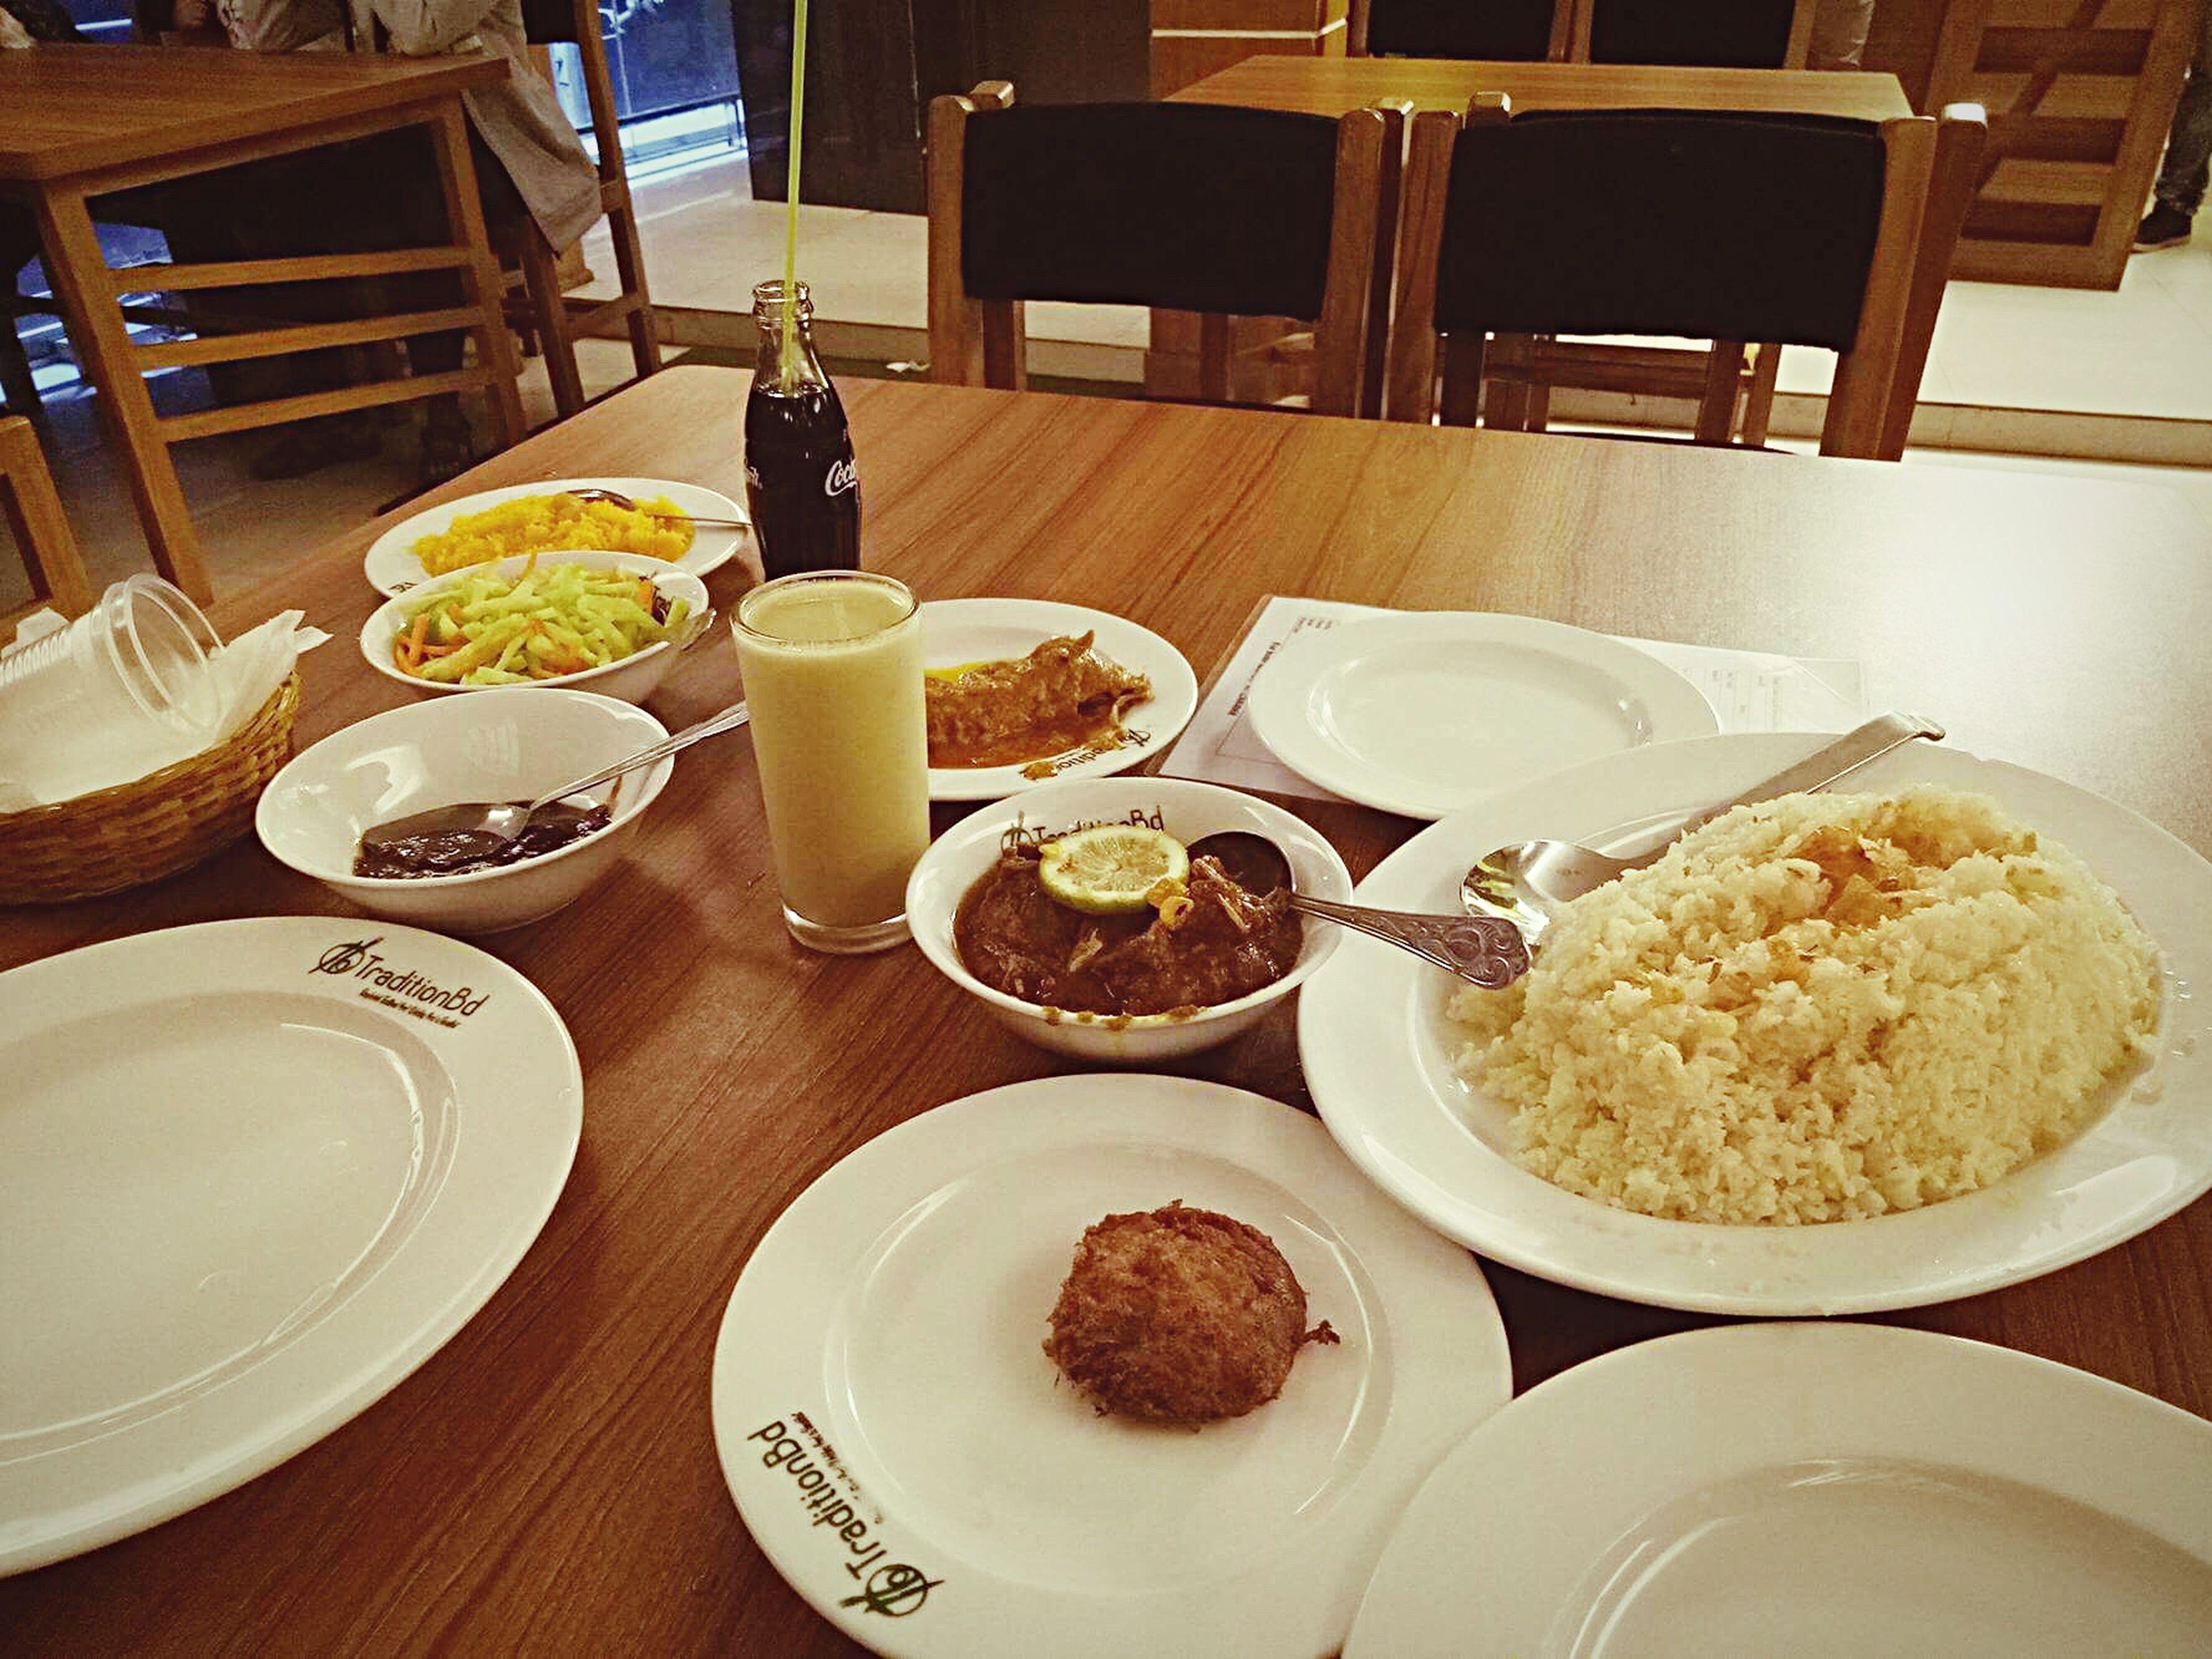 Delicious Bengali Food Polau Chicken Roast Beef Rezala Tikka  Borhani Jordavaat Coke